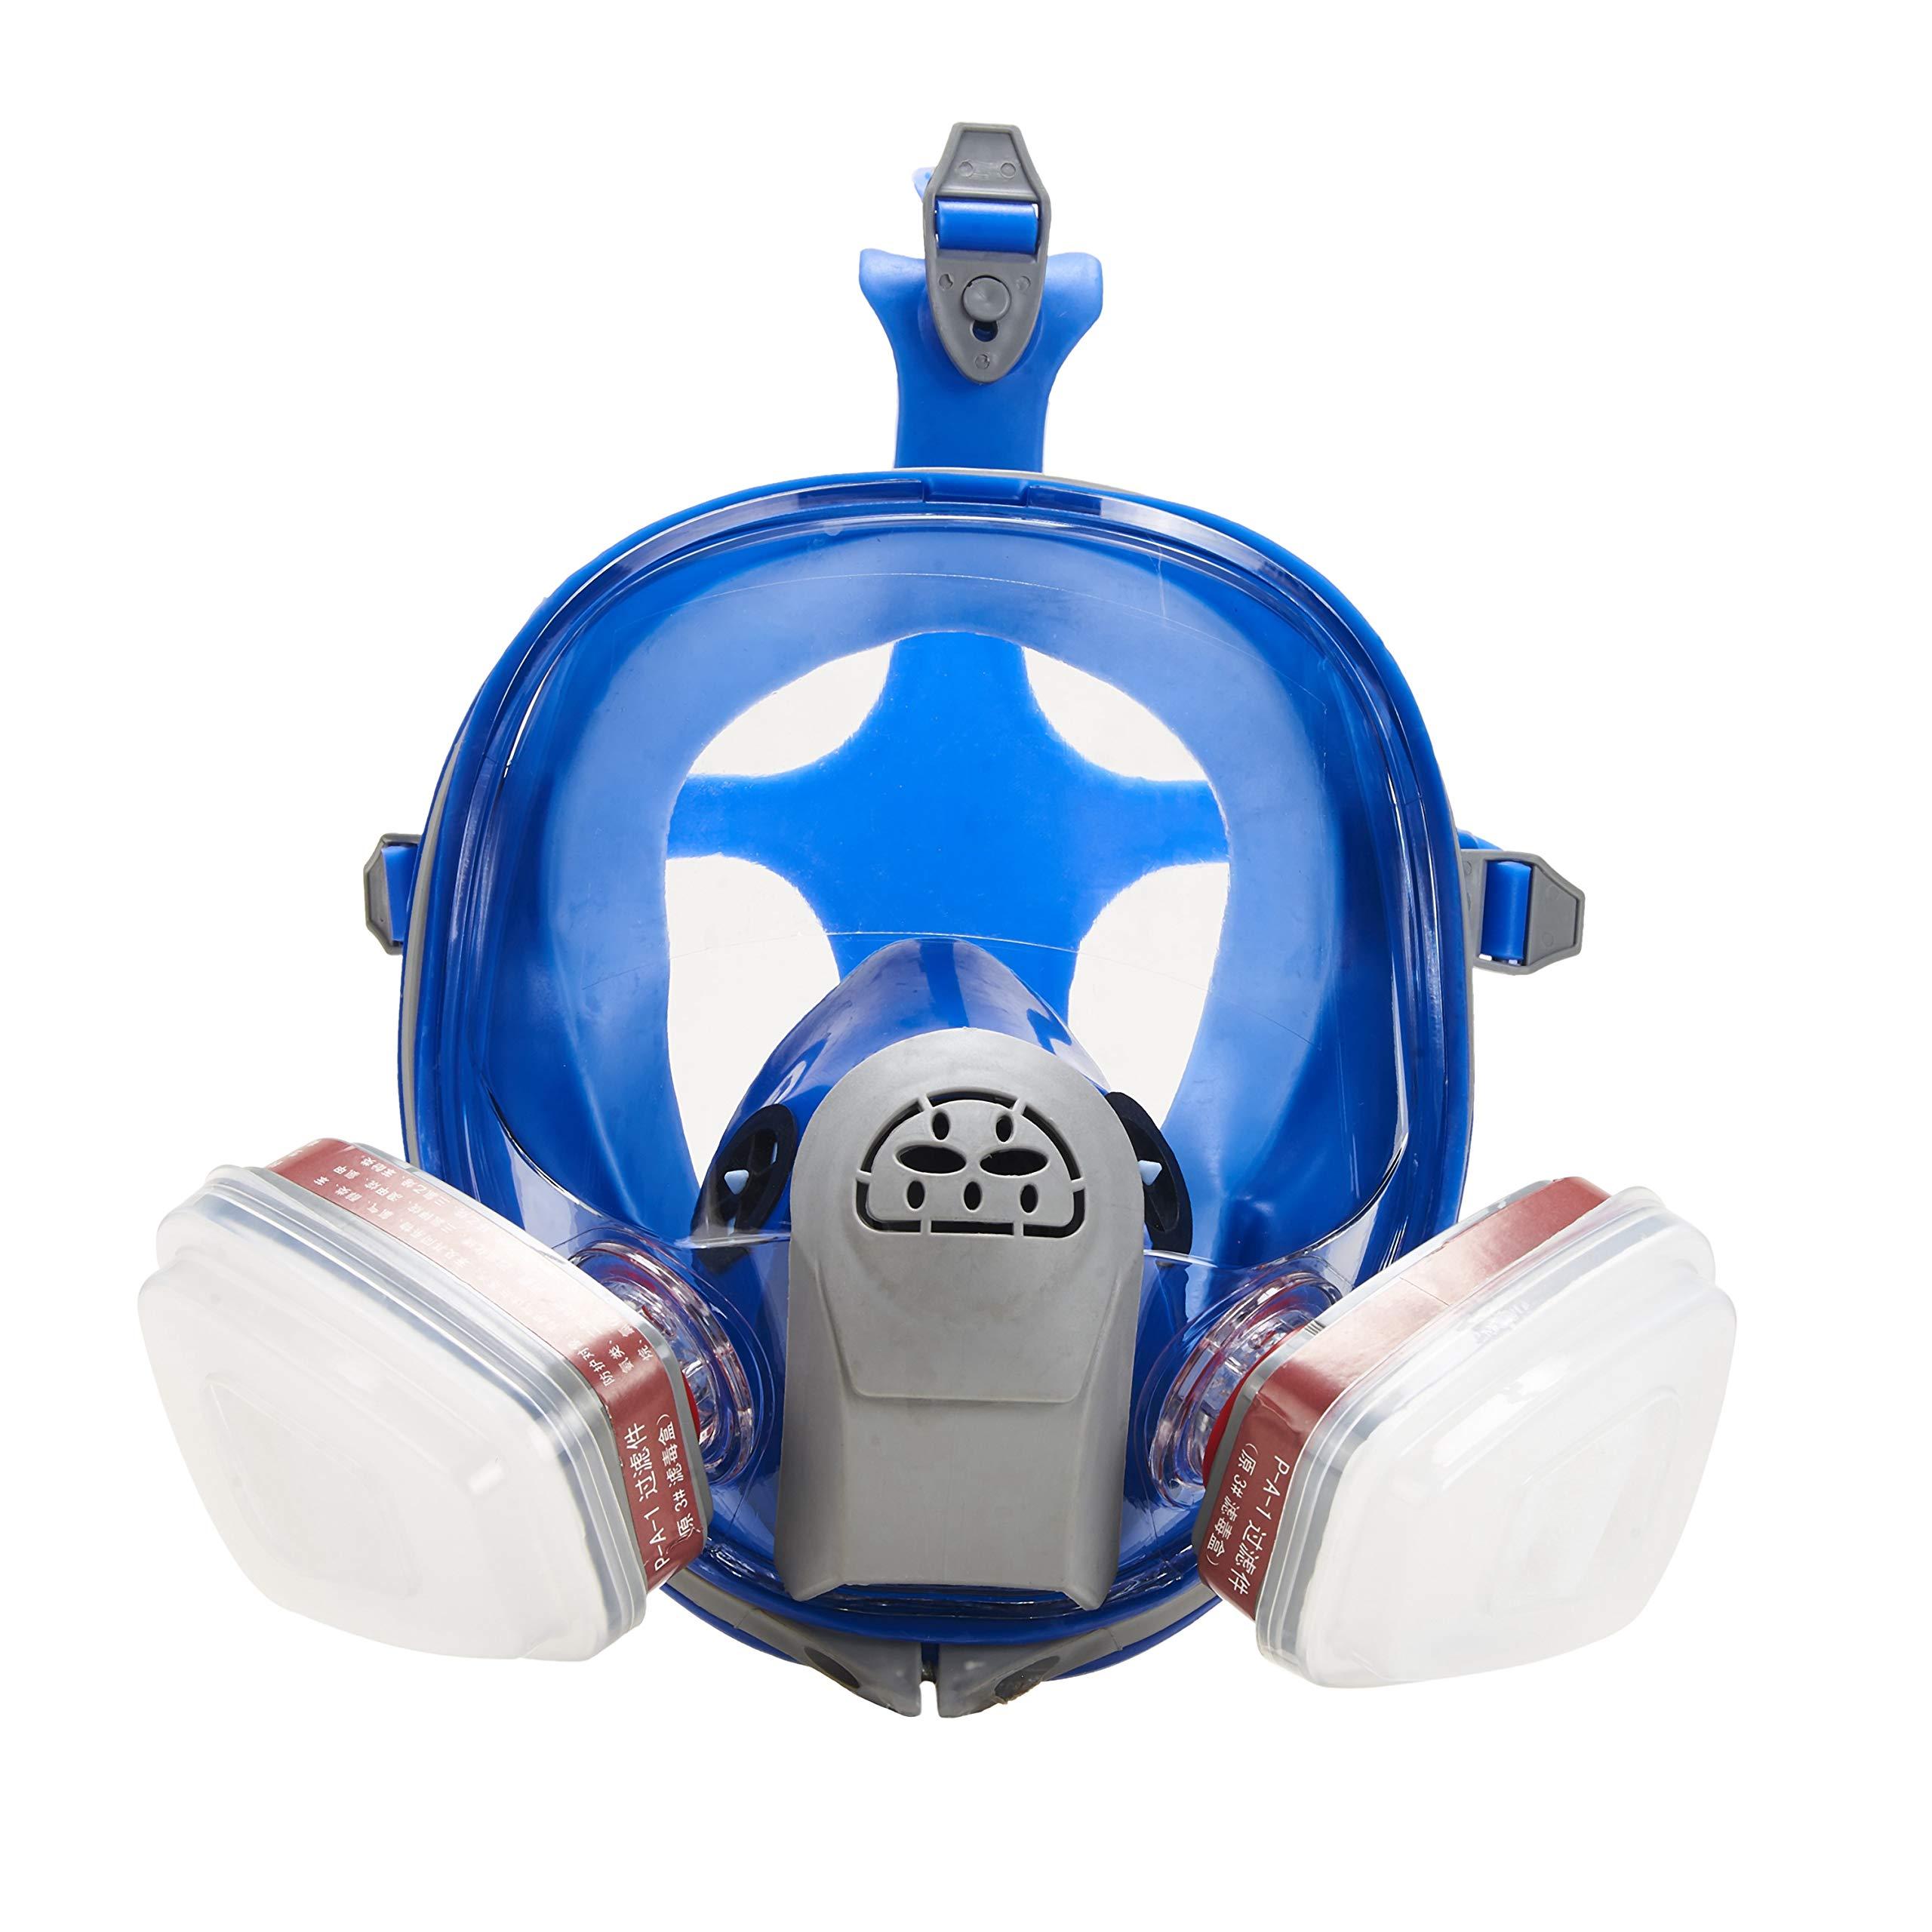 Holulo Organic Vapor Full Face Respirator Respiratory Safety Mask Paint Chemical Formaldehyde Anti Virus (Safety mask+LDY3 Filter cartridge+Filter cotton)